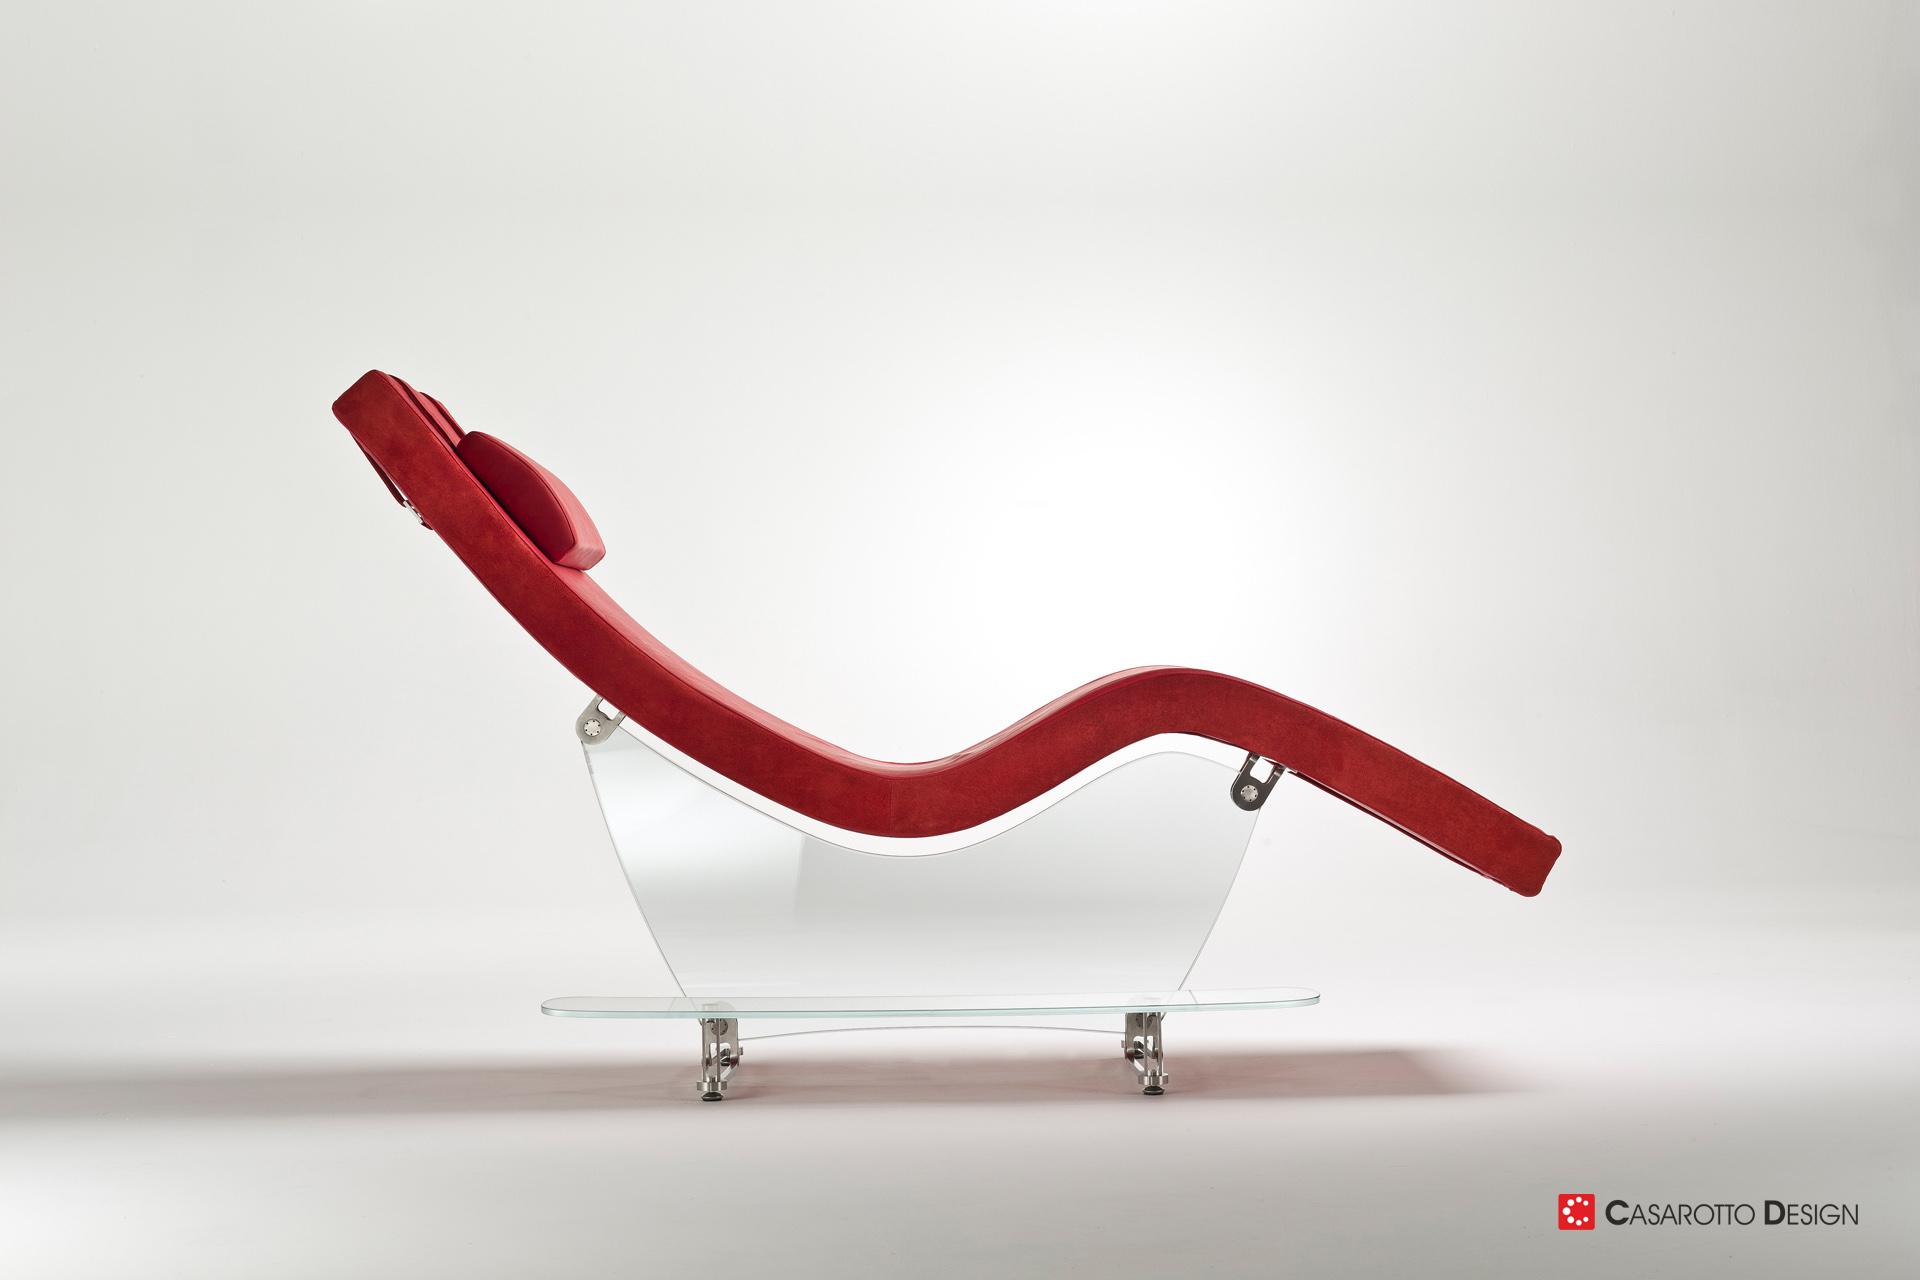 Chaise Longue Glass Longue design by Simone Casarotto engineering Mario Fantoni poltrona pelle vetro